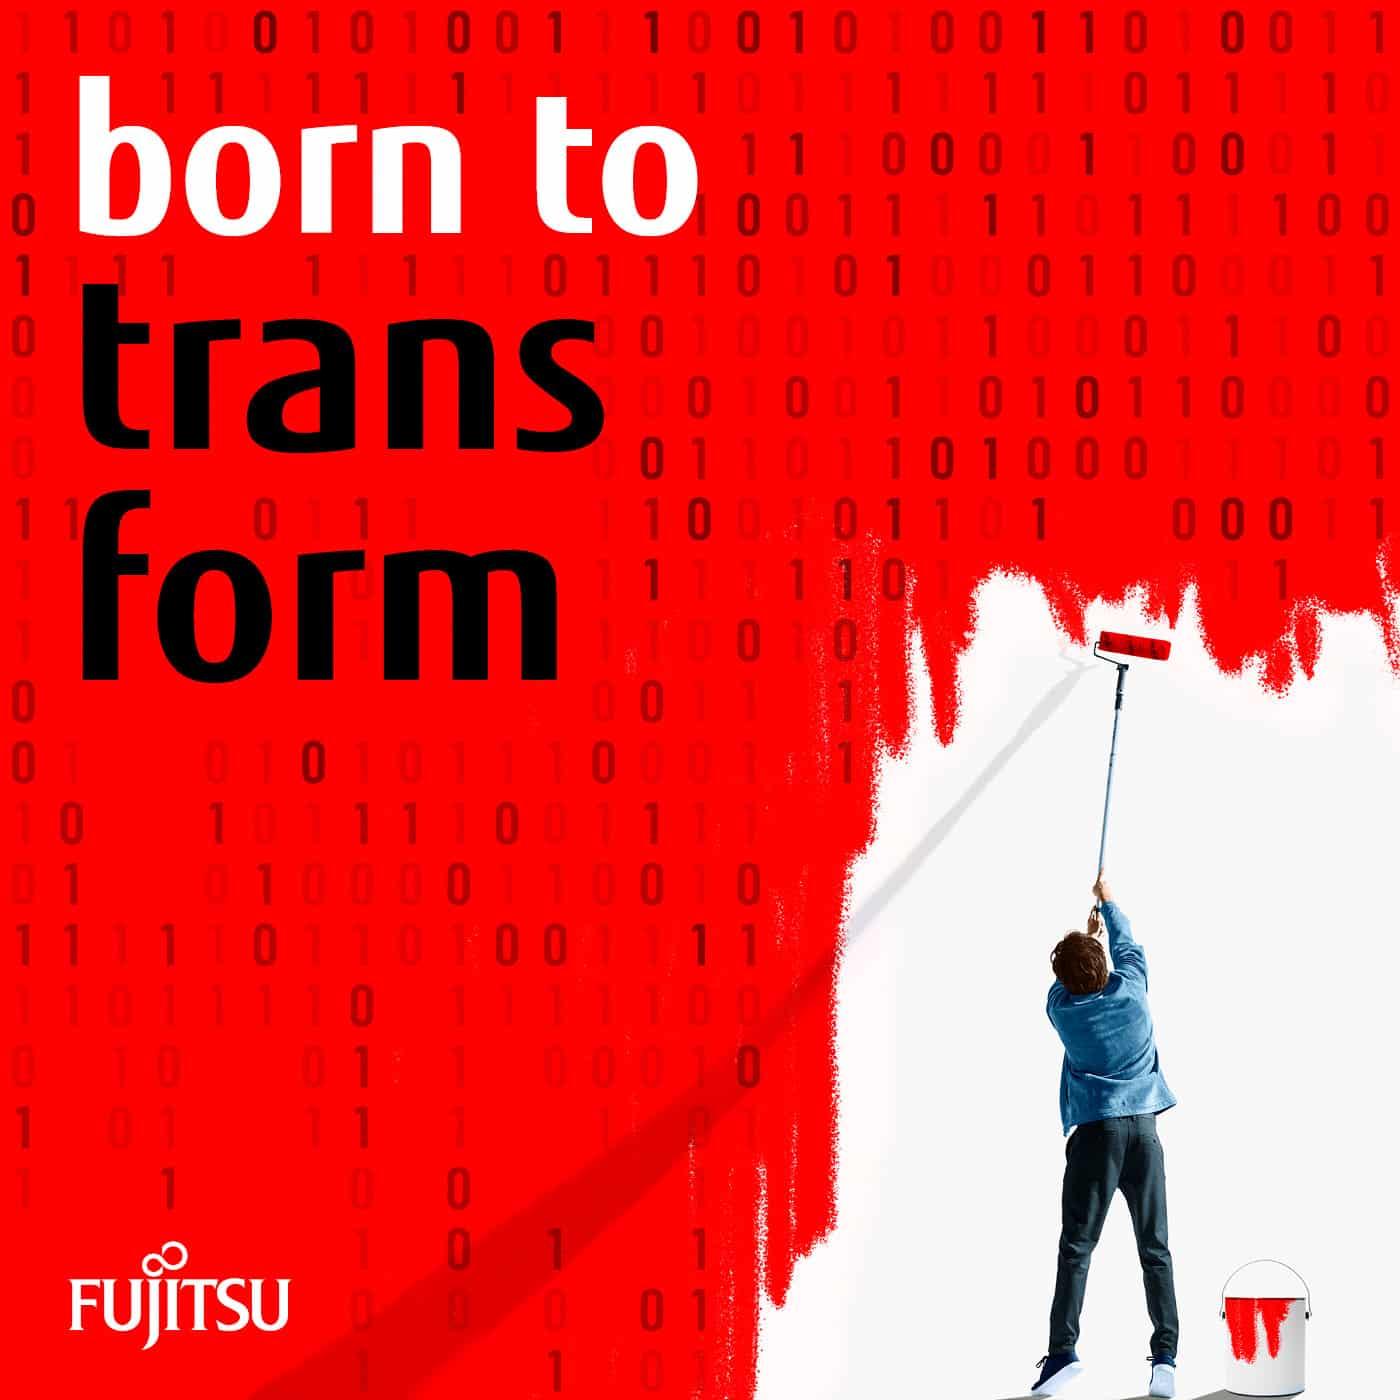 Fujitsu Podcast: Born to transform